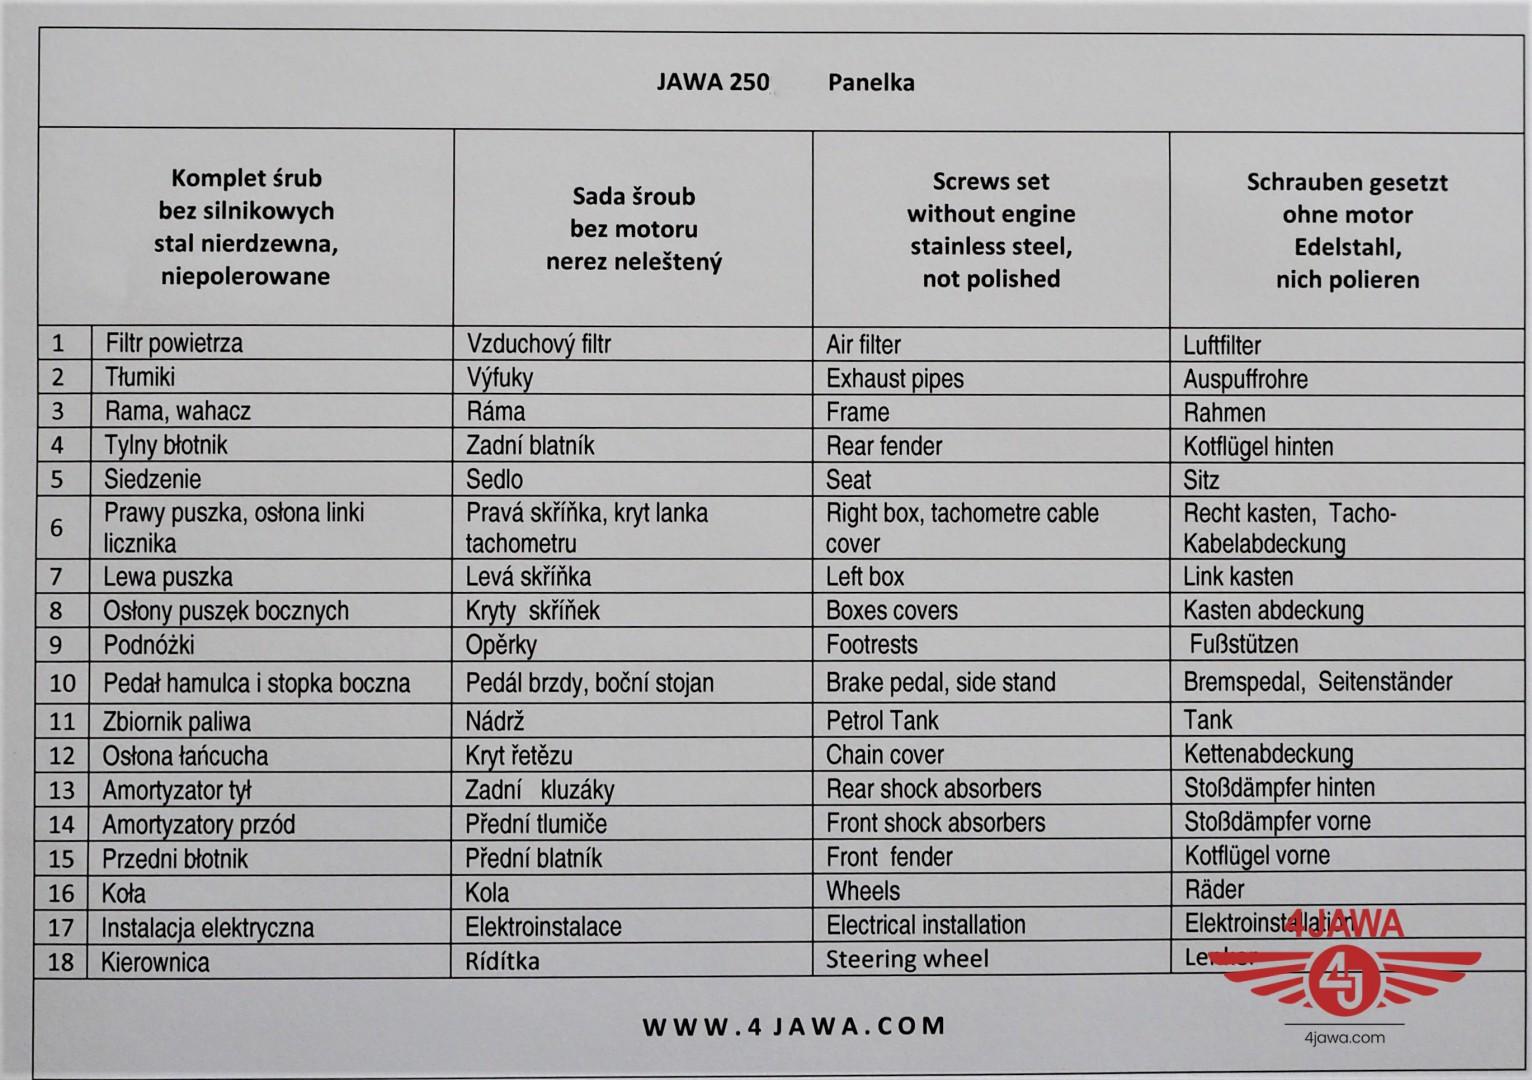 Screw Set All Without Engine Stainless Jawa 250 Panelka